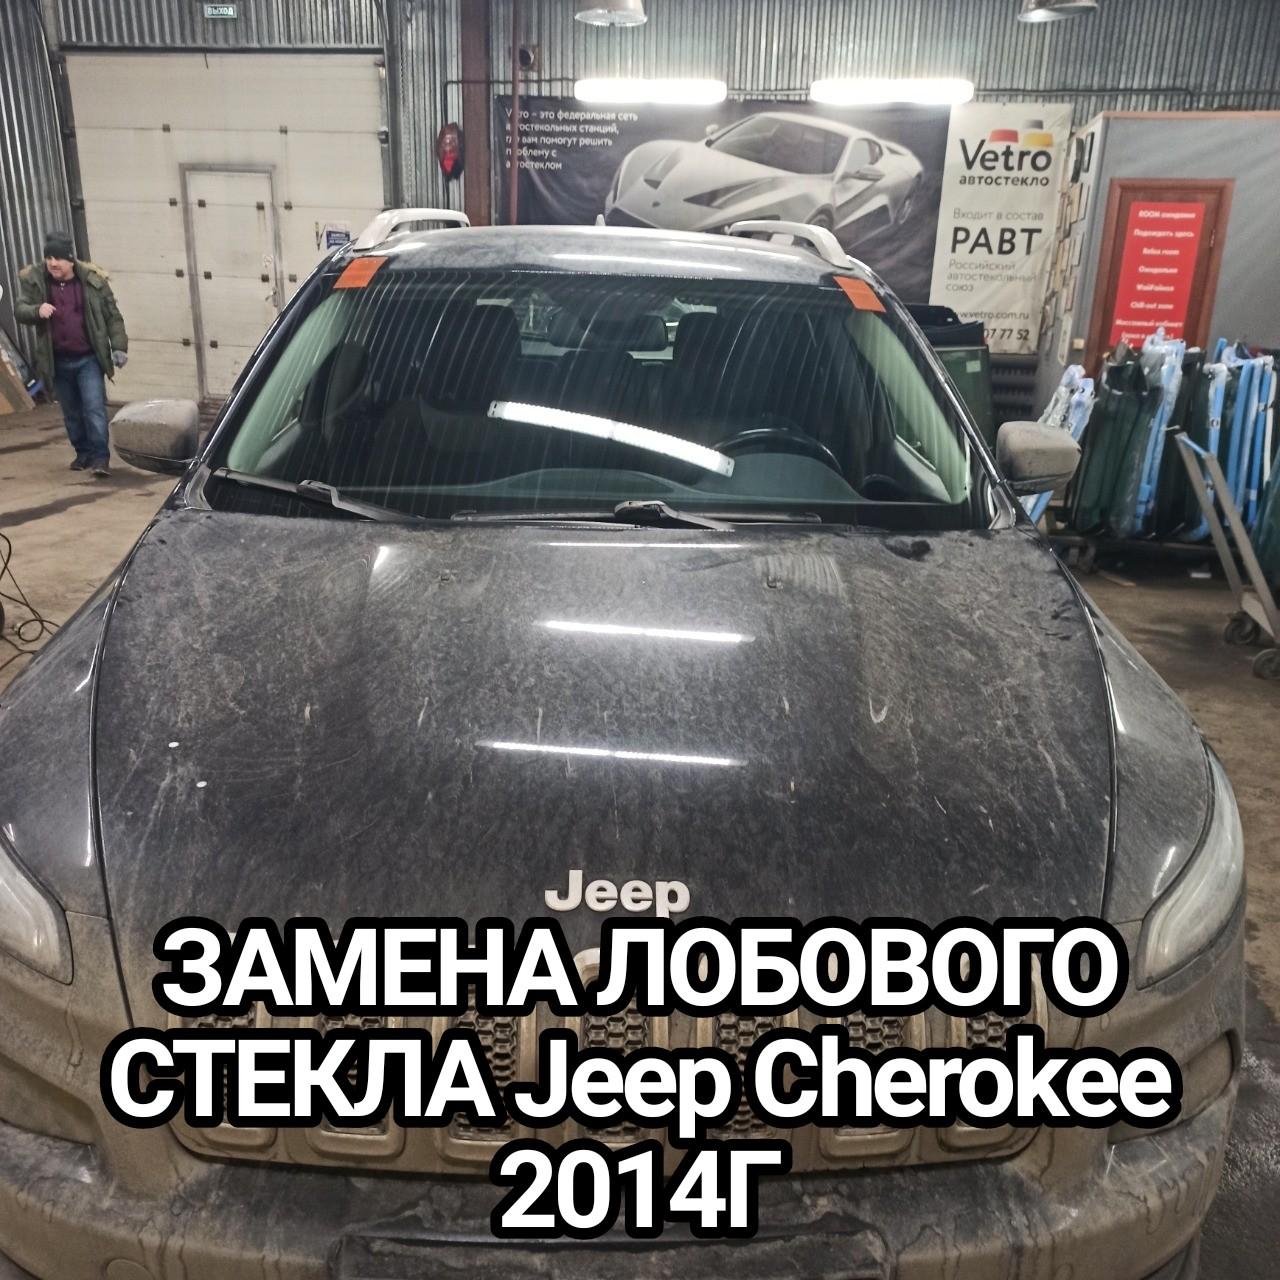 ЗАМЕНА ЛОБОВОГО СТЕКЛА Jeep Cherokee 2014Г